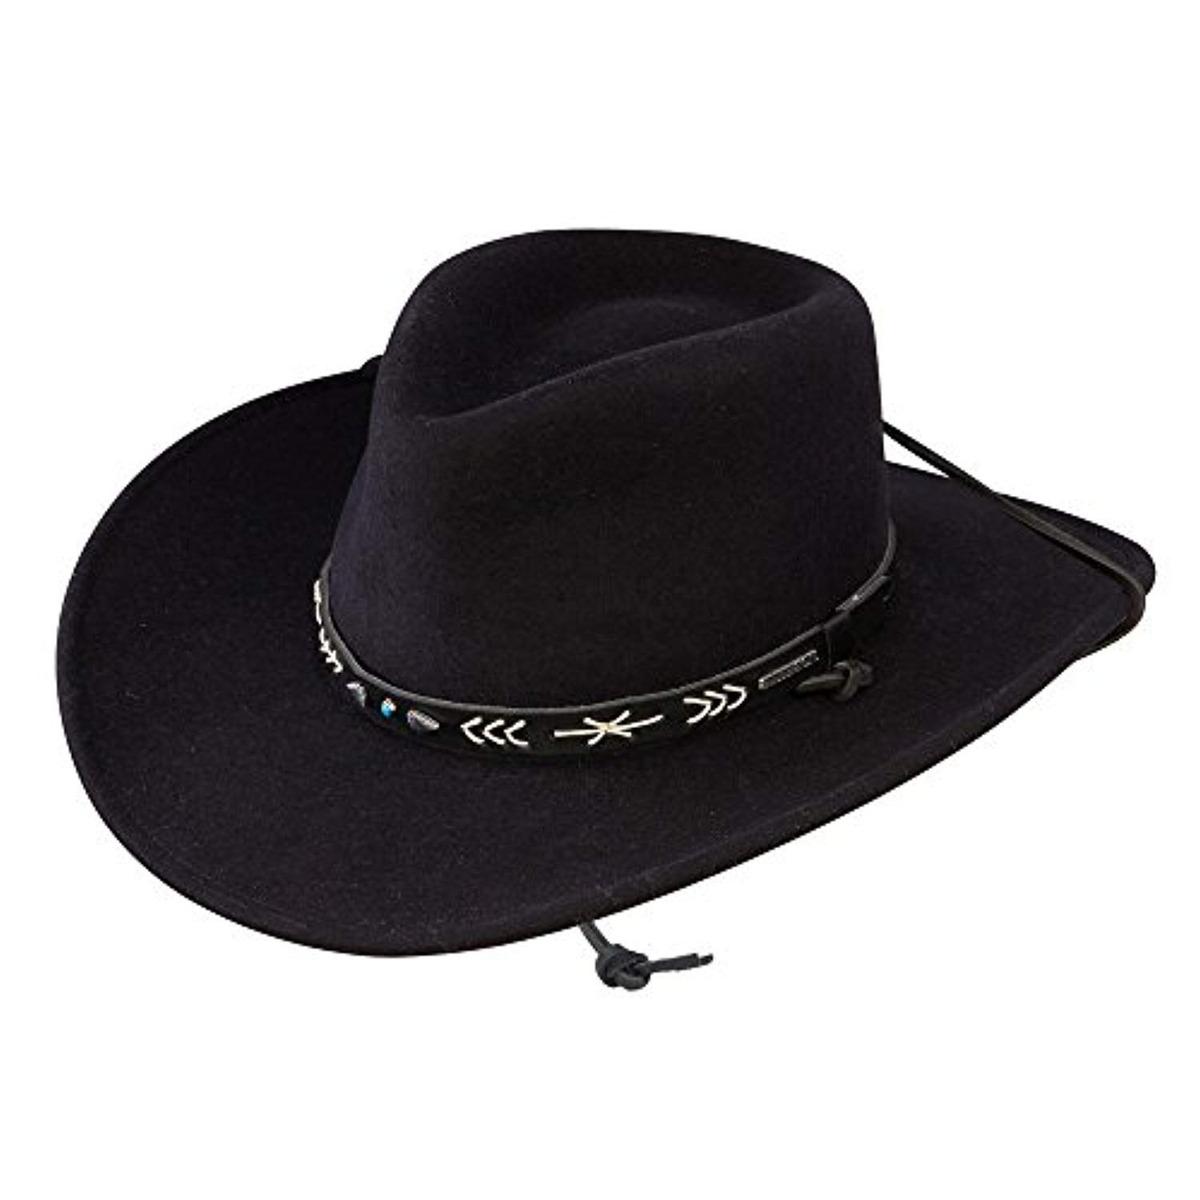 53c3b91bb Sombreros San Diego Hat Company Men S Distressed Fedora